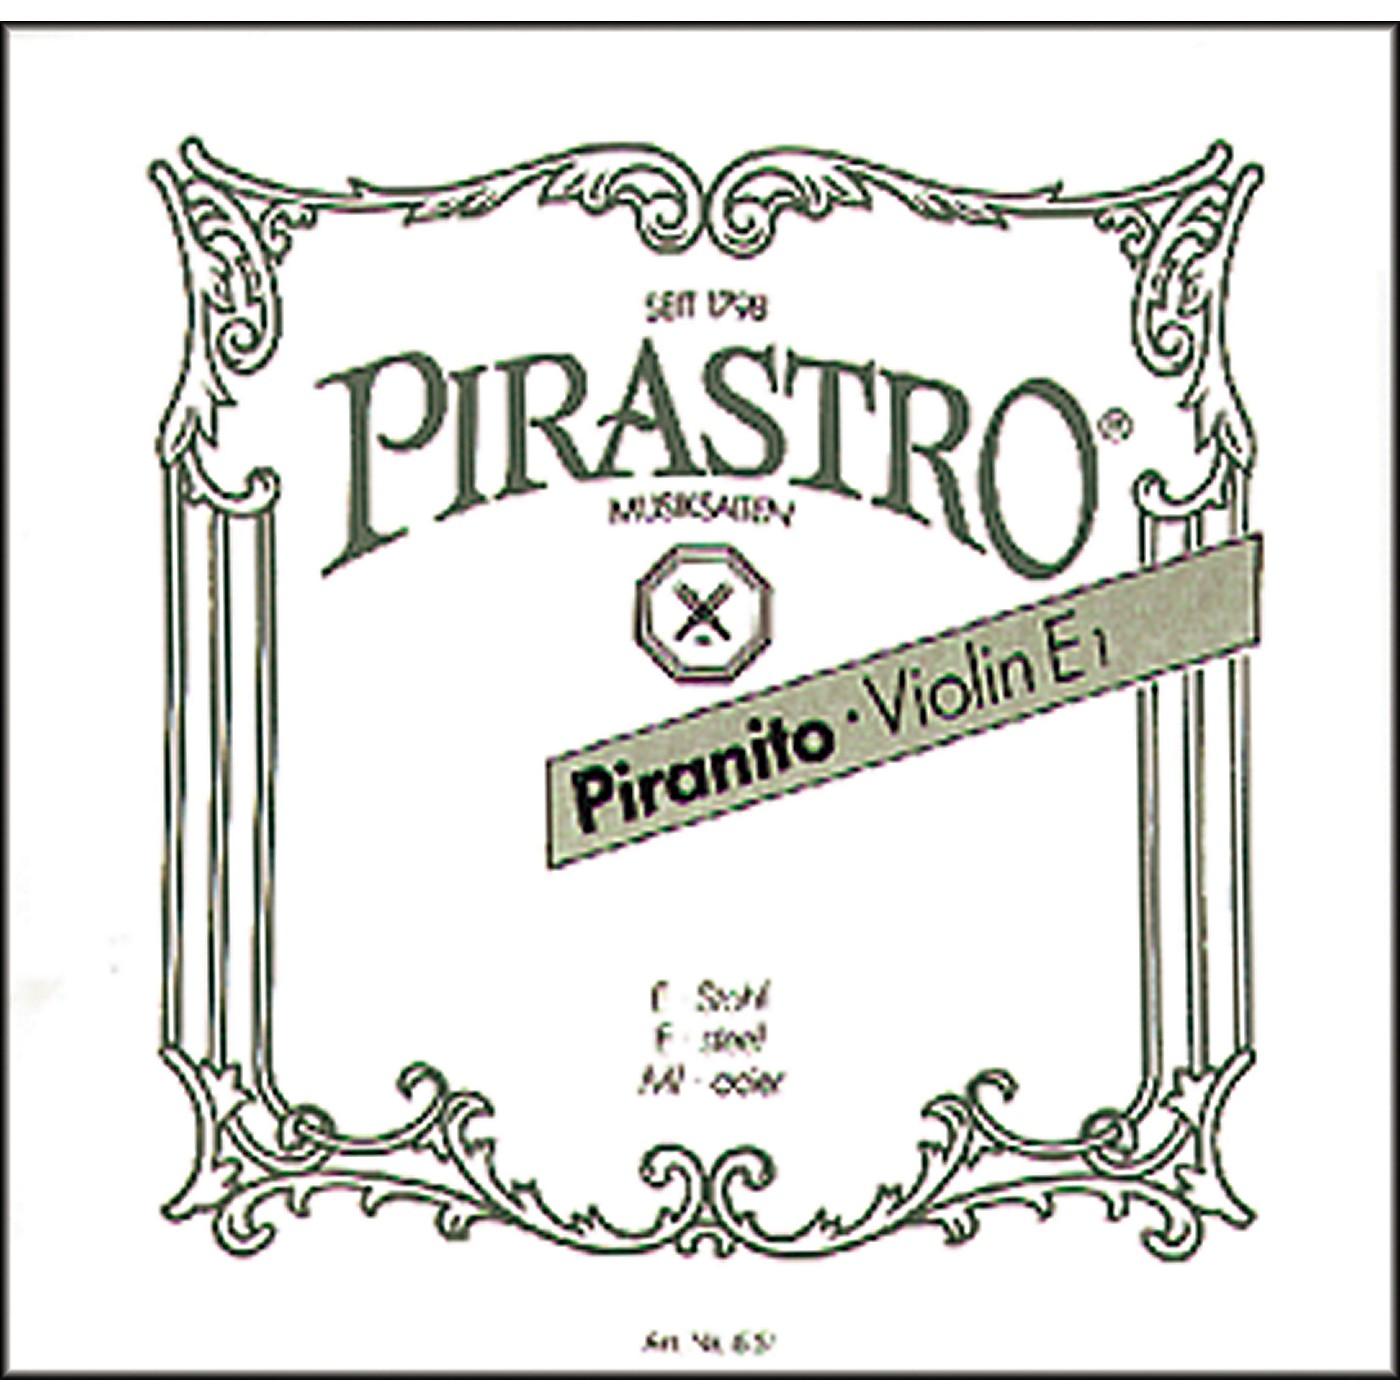 Pirastro Piranito Series Violin String Set thumbnail